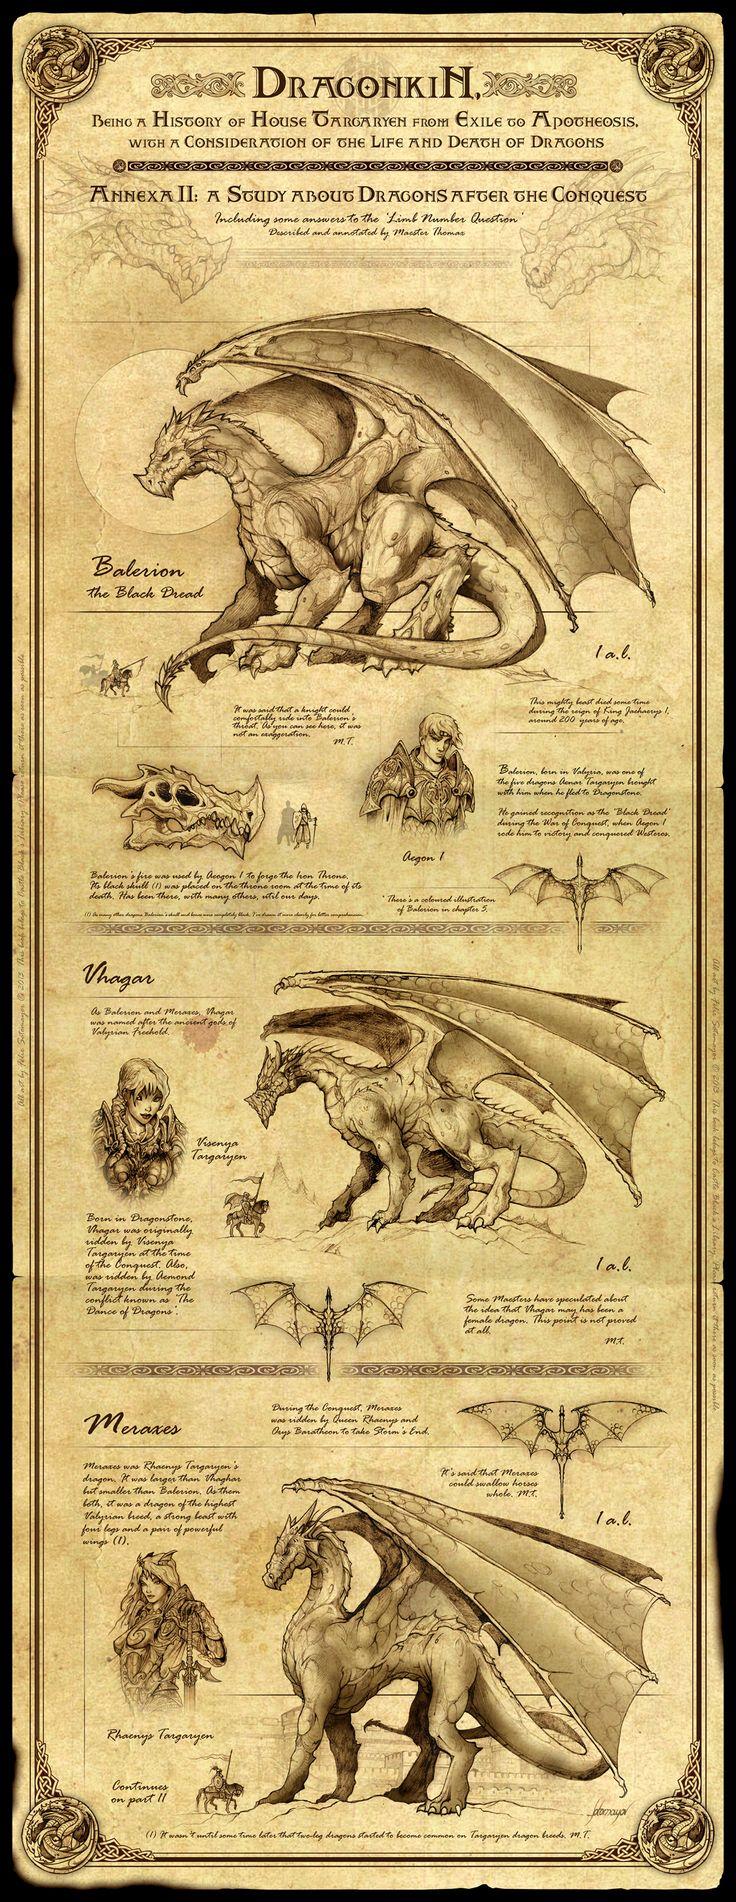 Dragonkin I by *Feliche on deviantART | a sweet encyclopedia-like description of the legendary dragons of Aegon.